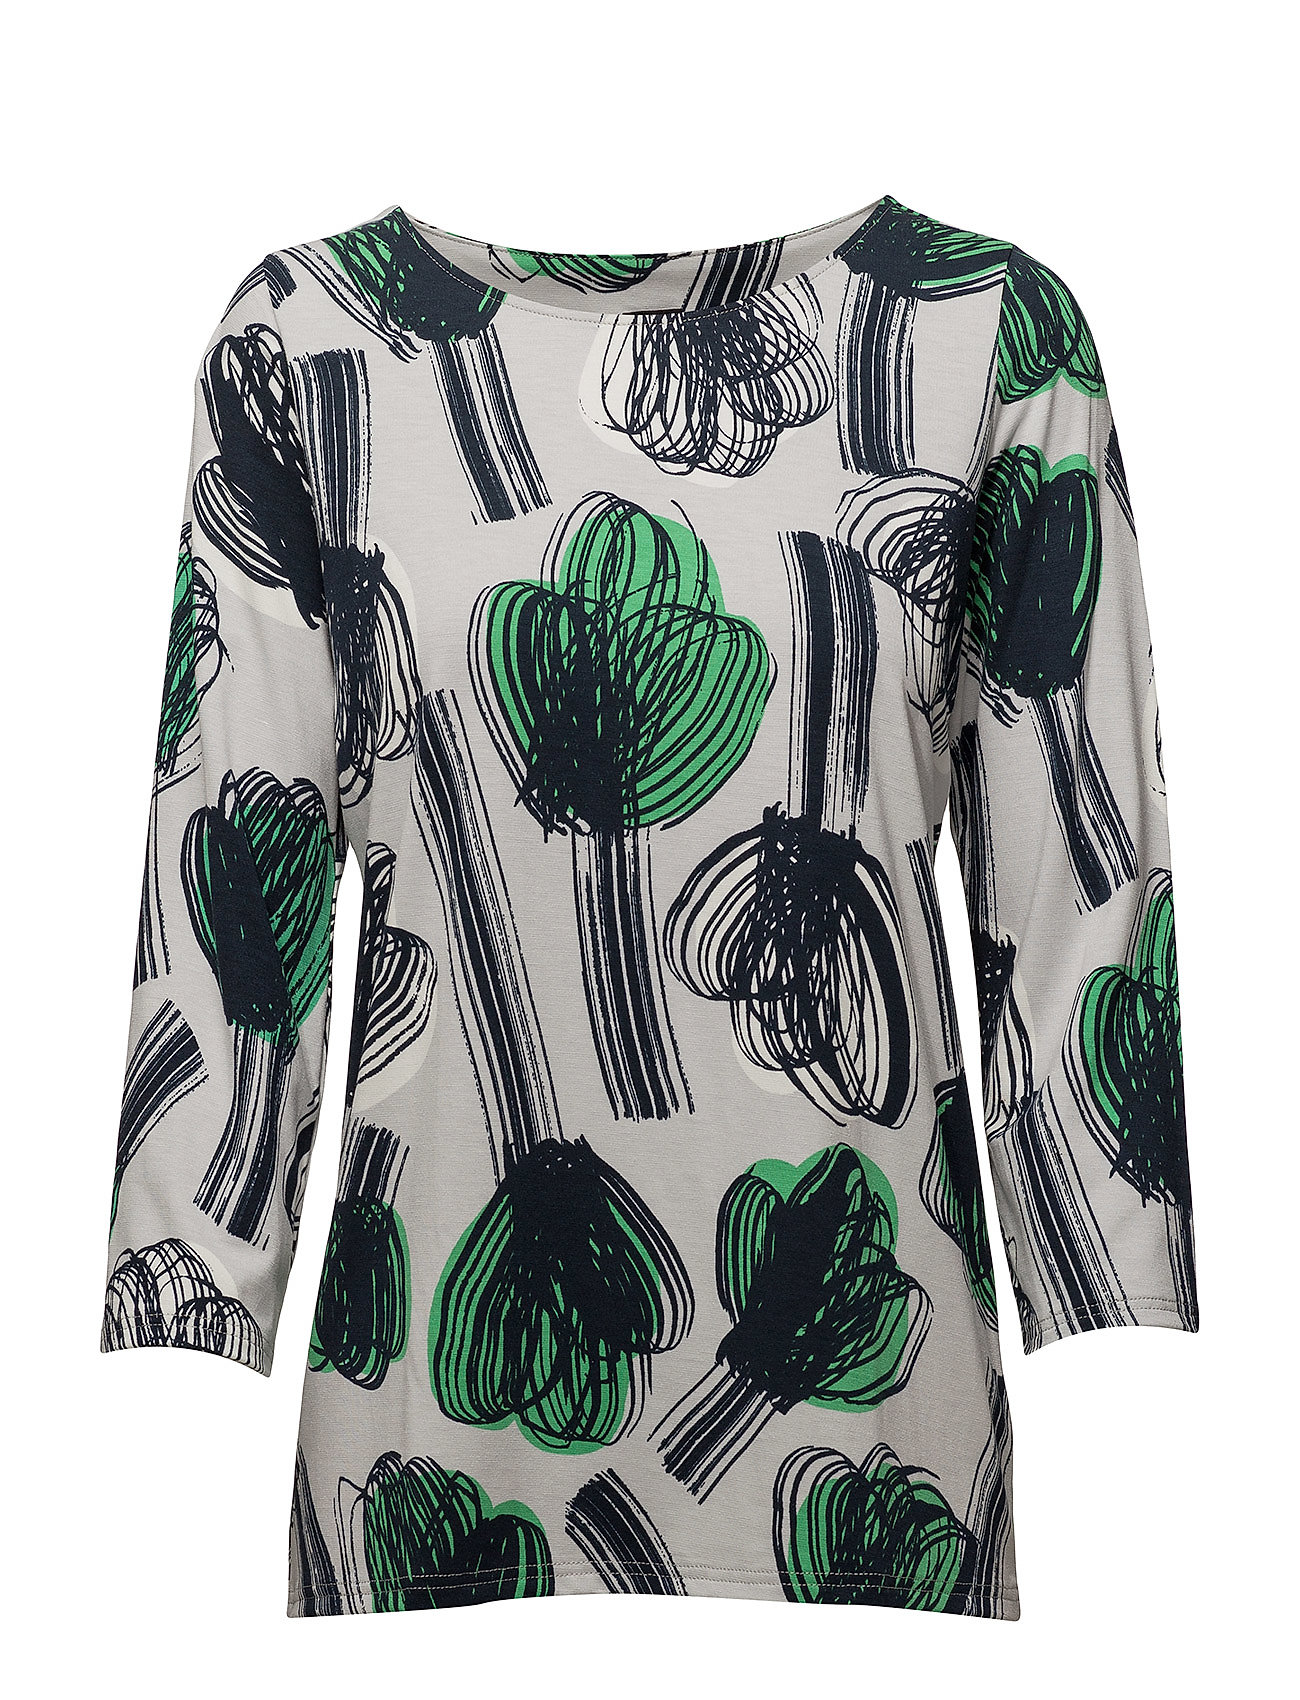 Nanso Ladies shirt, Nuppu - GREEN